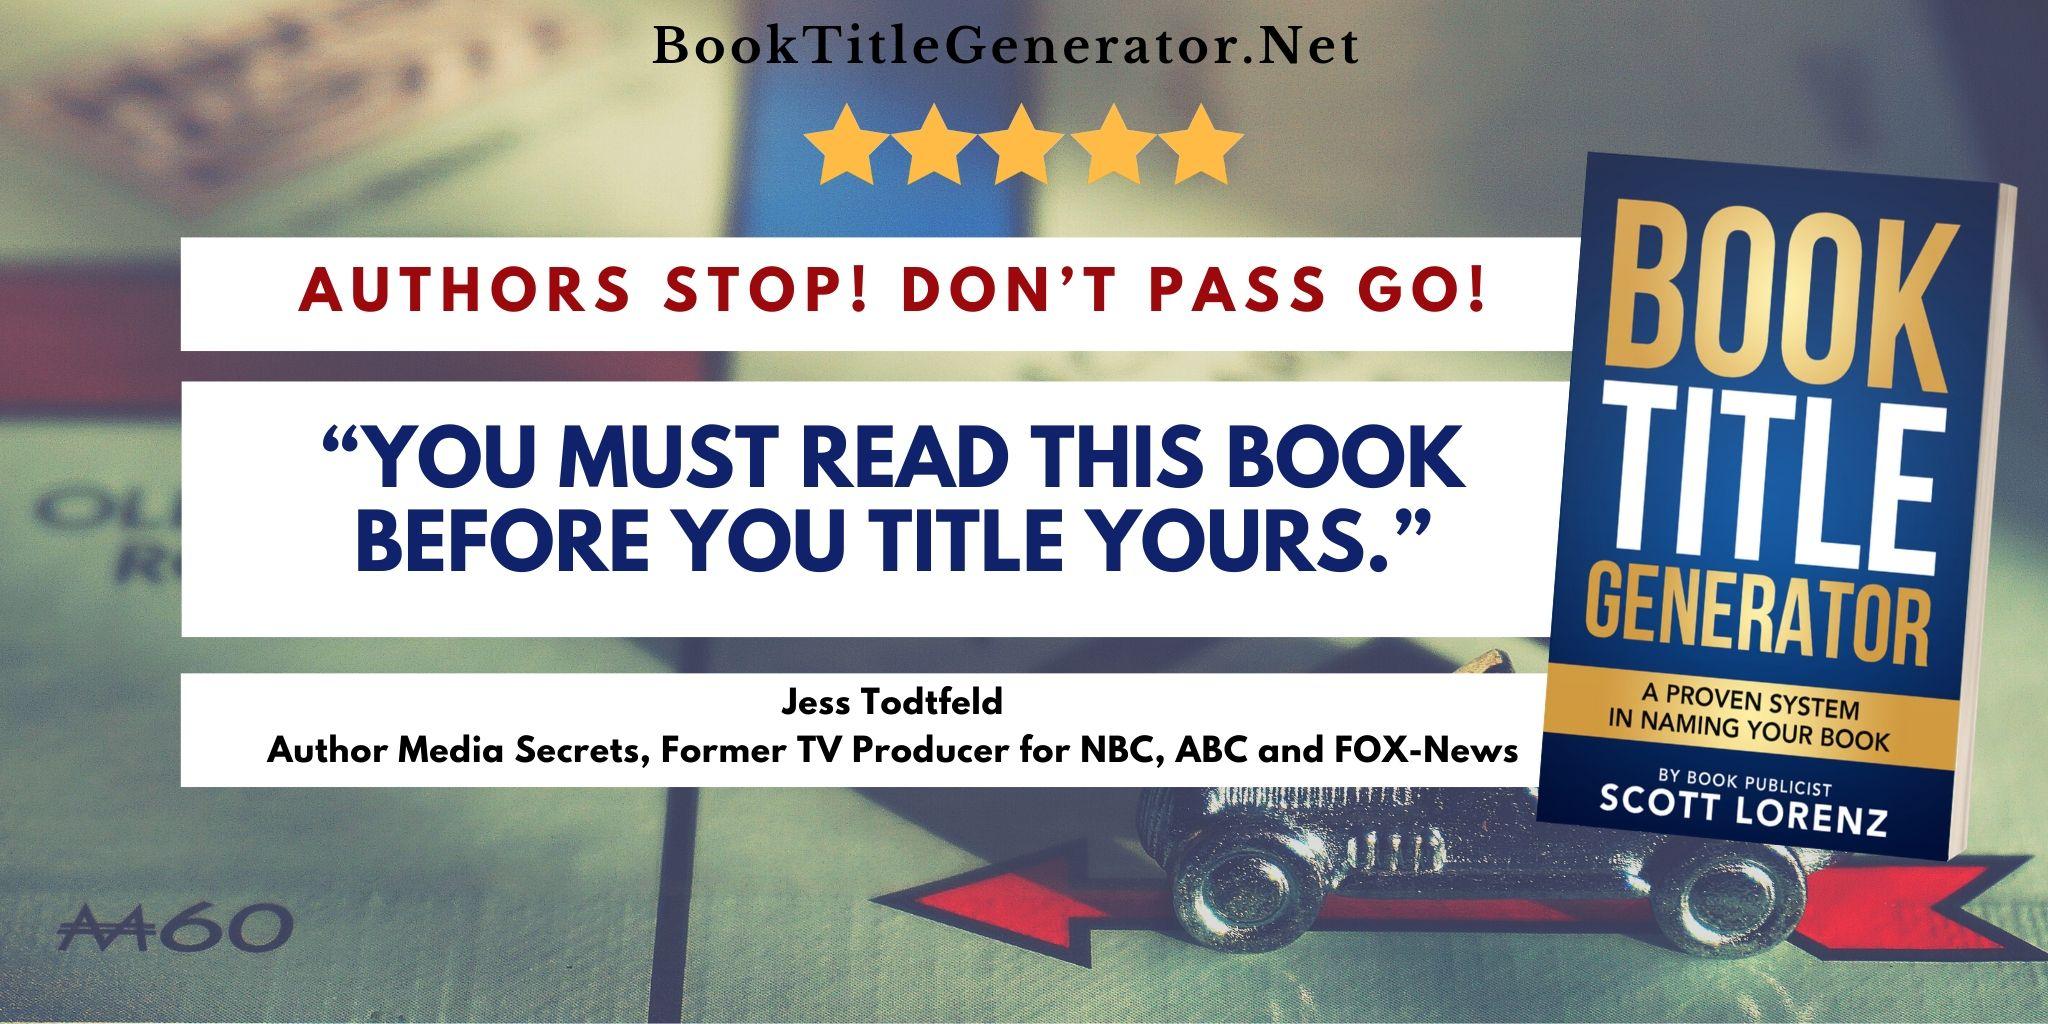 Jess Todtfeld about Book Title Generator